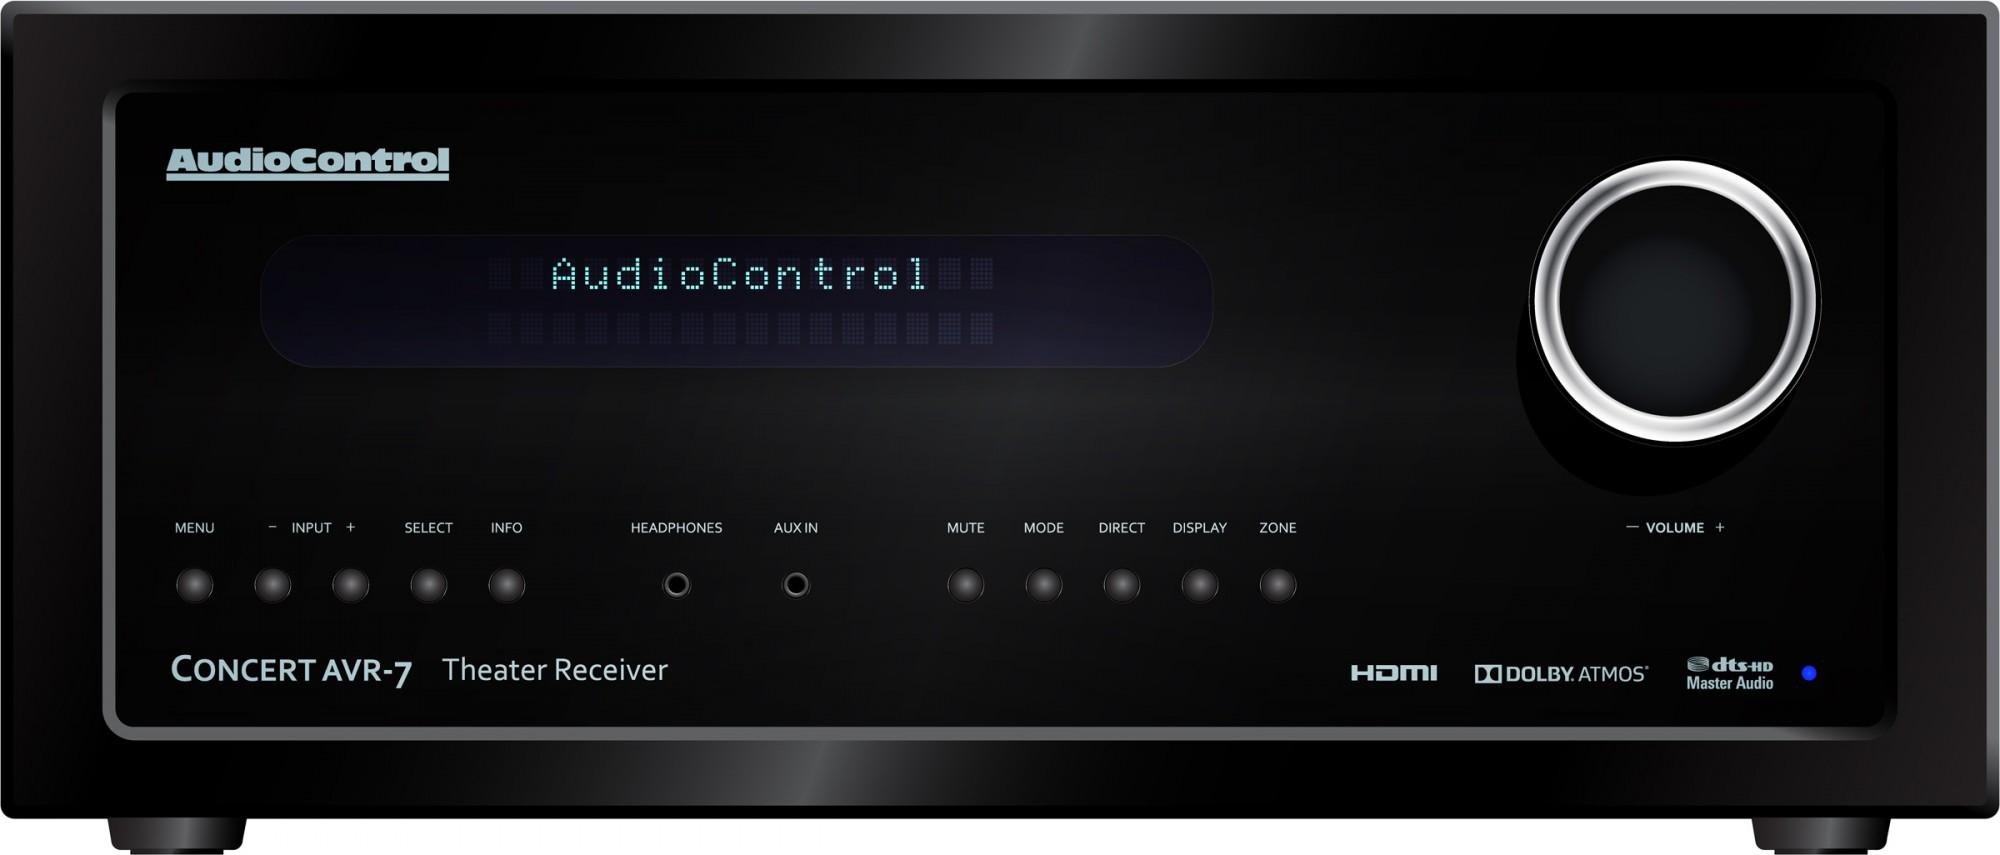 ampli home cinema Audiocontrol AVR-7 Dirac Patmos 4k à cap d'antibes